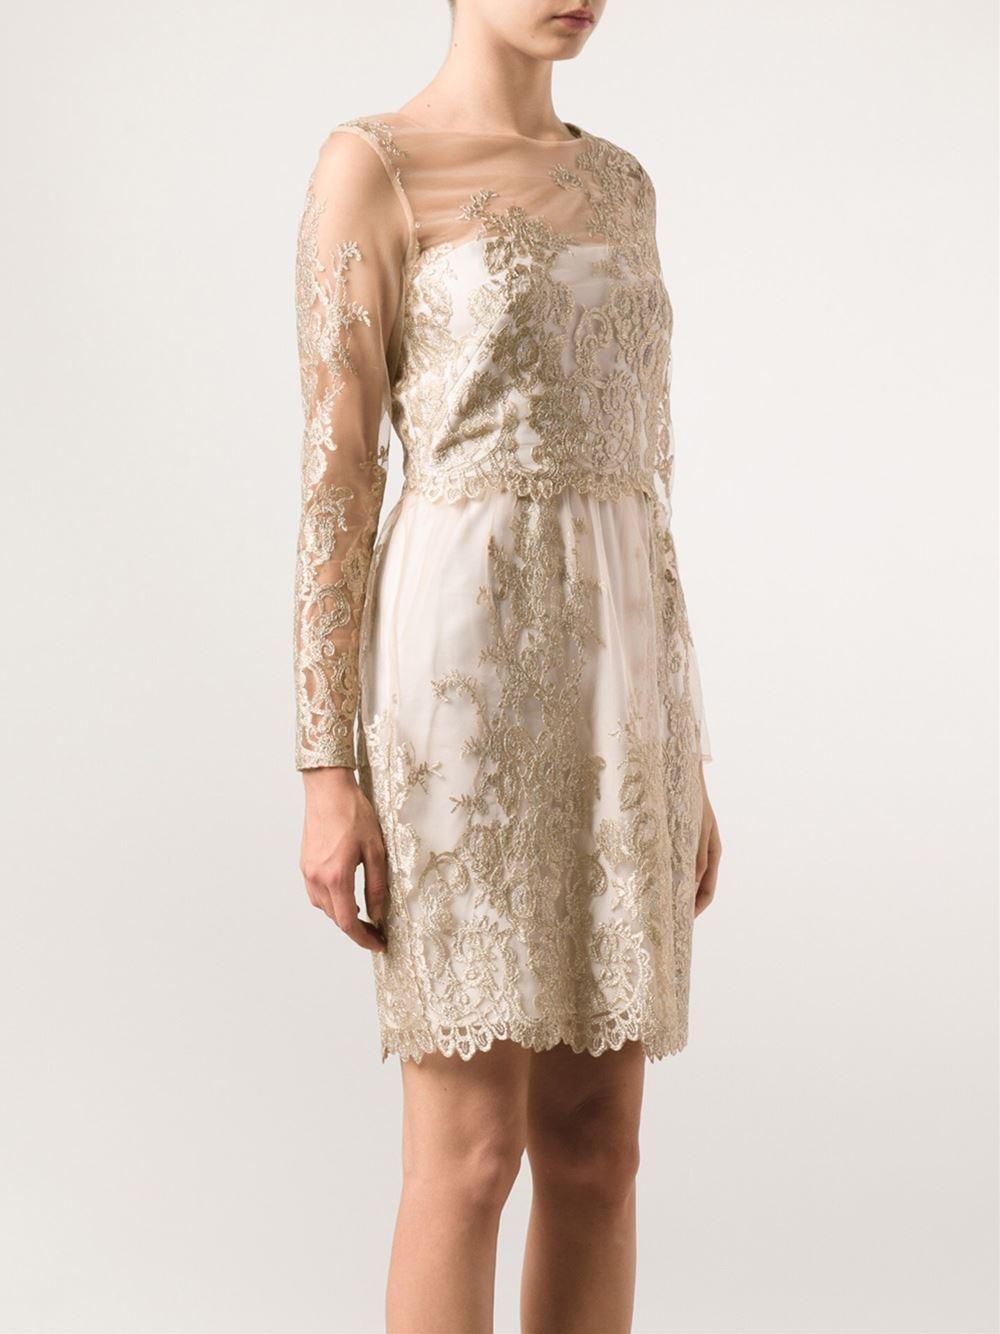 dfa7f6c47a Marchesa notte Metallic Lace Cocktail Dress in White - Lyst